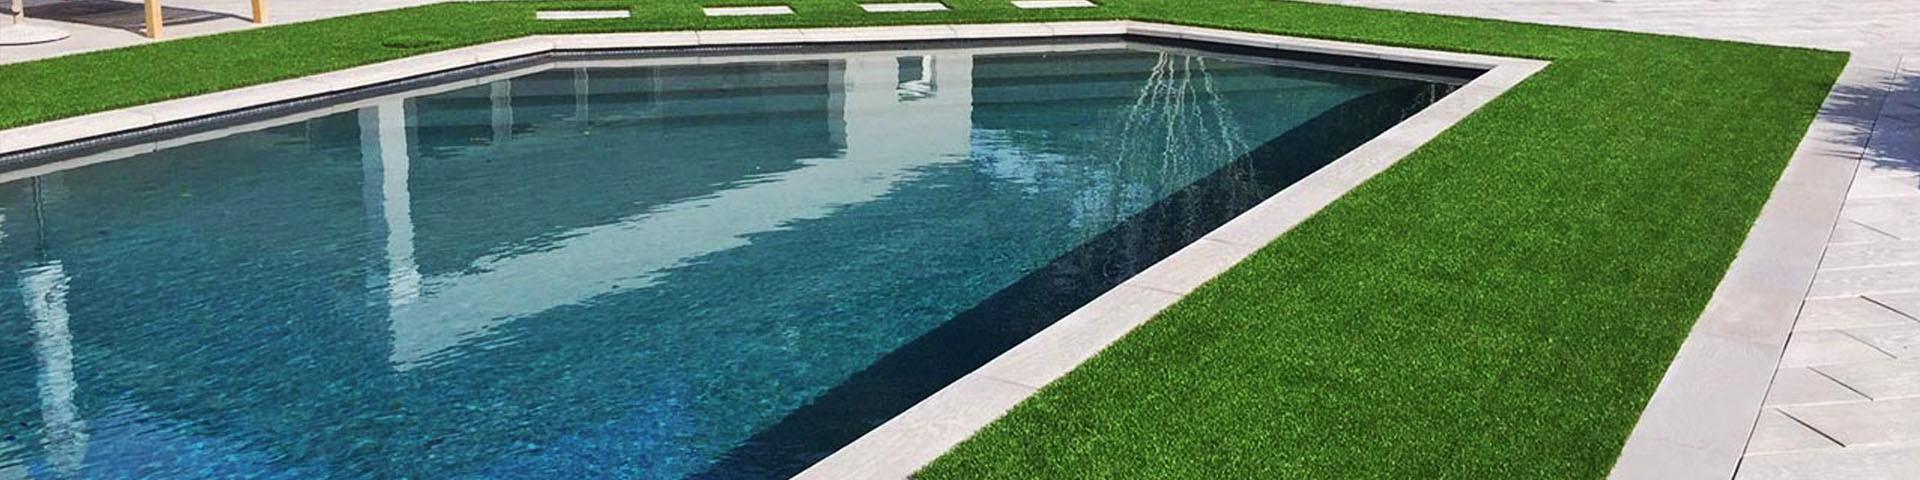 Distributeur grossiste de gazon synthétique jardin piscine terrasse